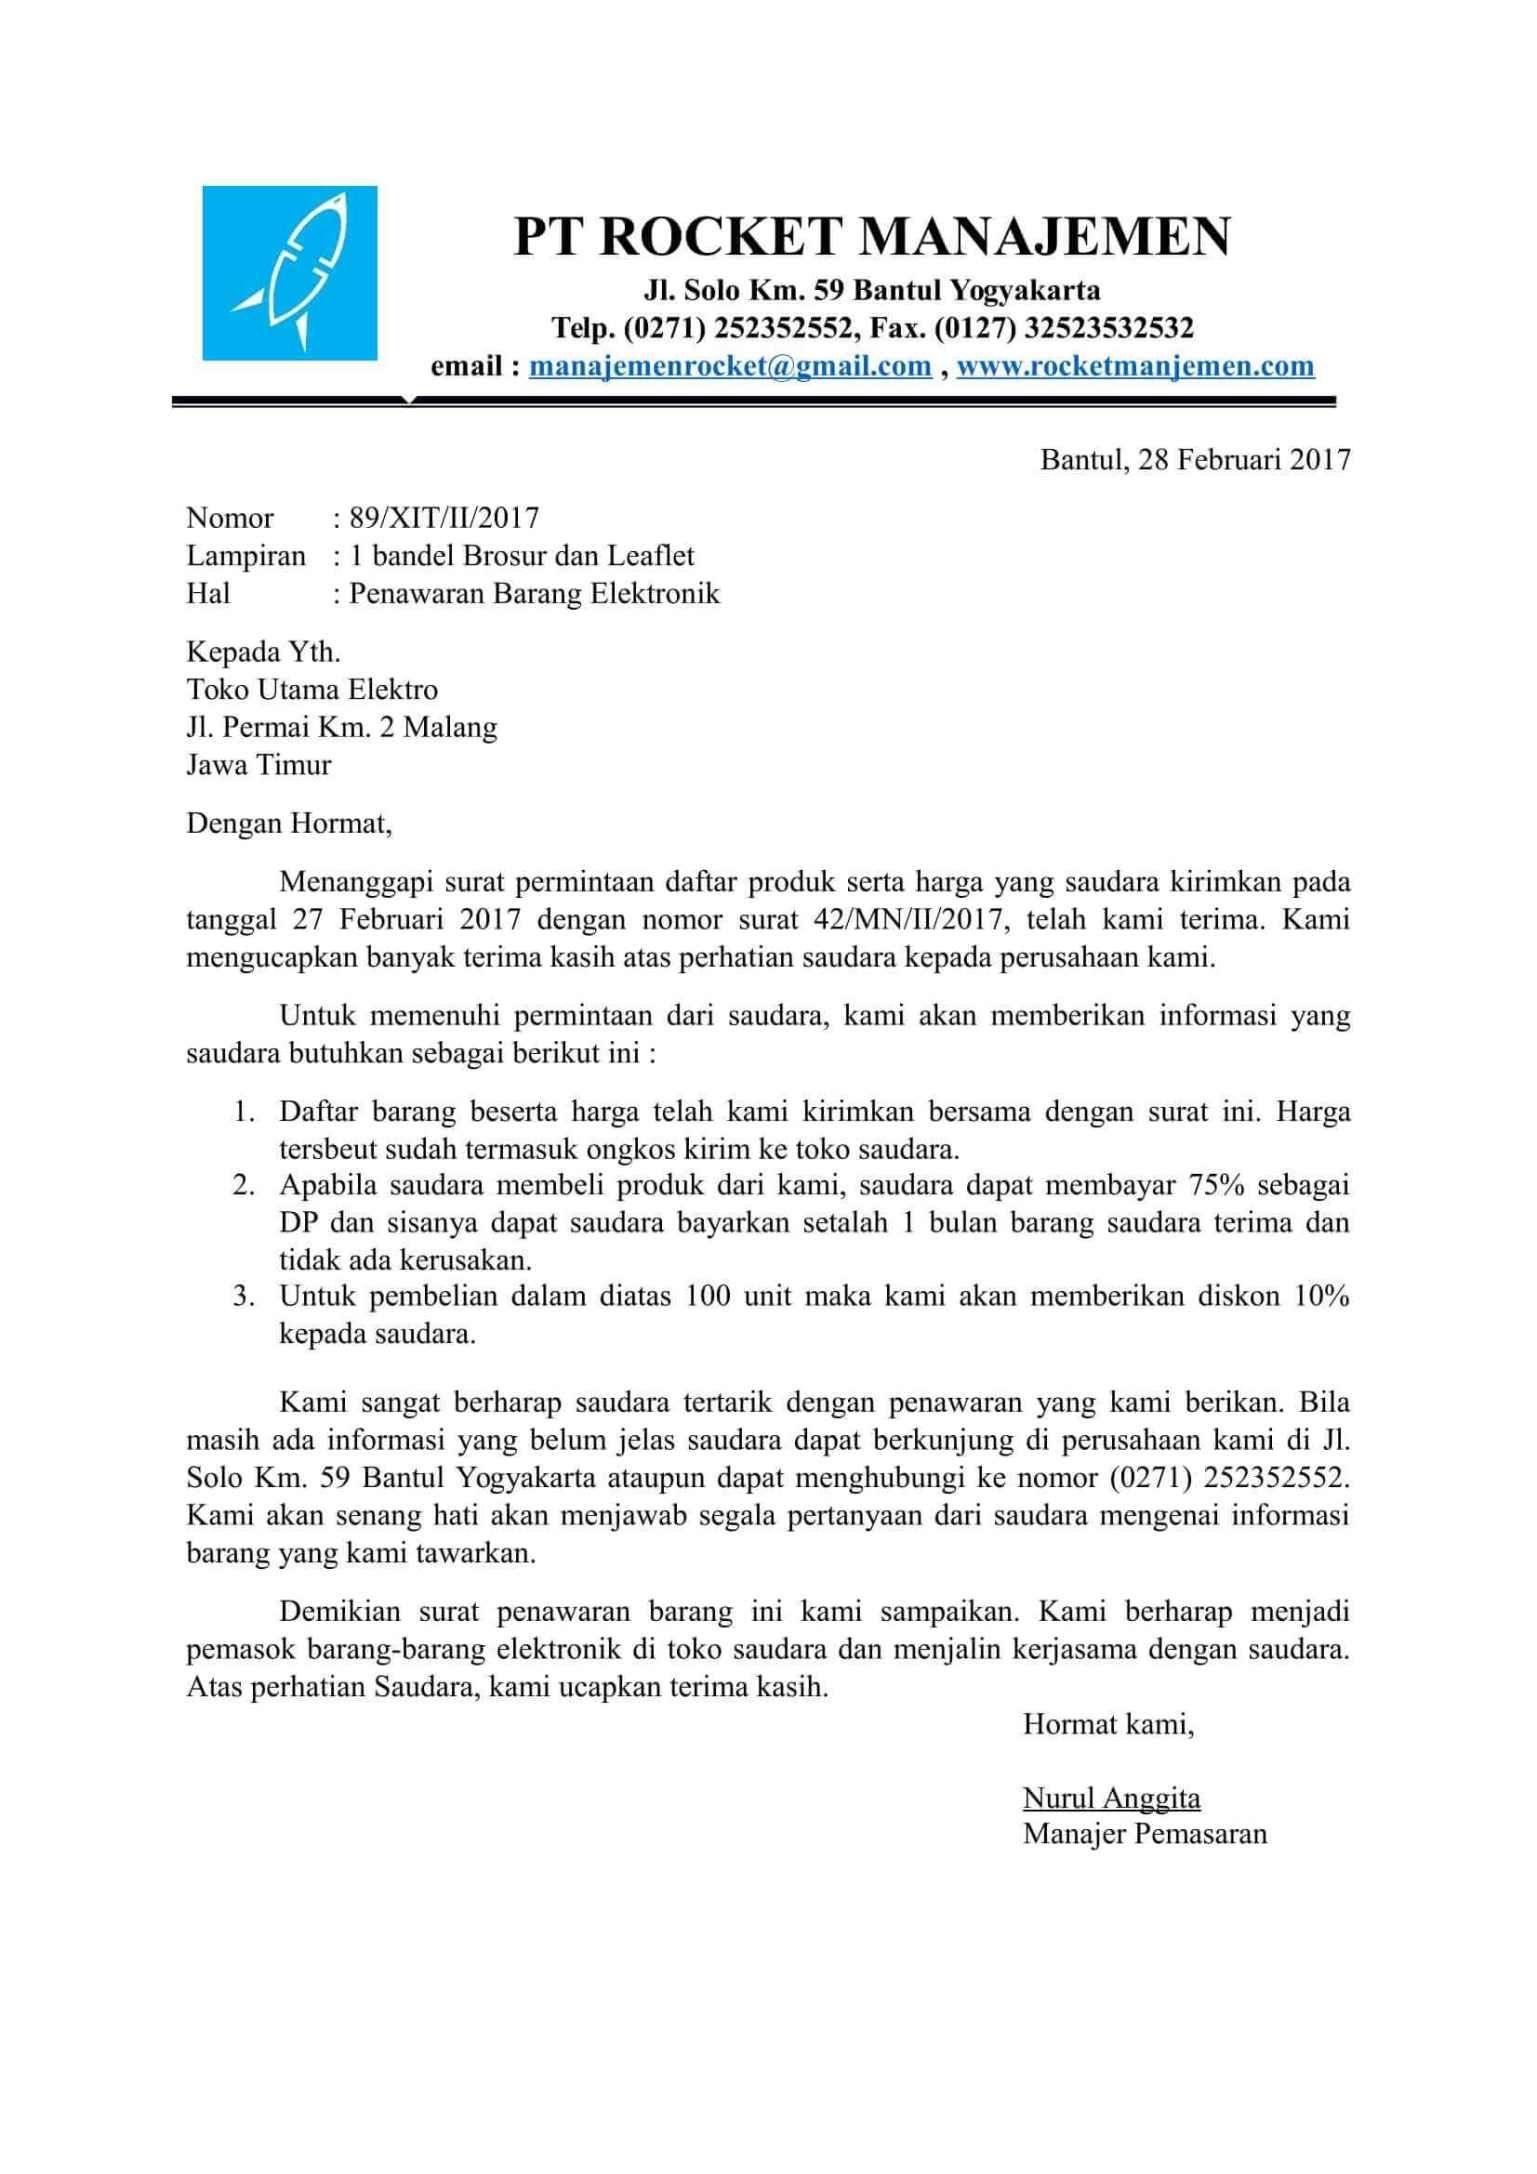 25+ Contoh surat penawaran barang elektronik doc terbaru terbaik